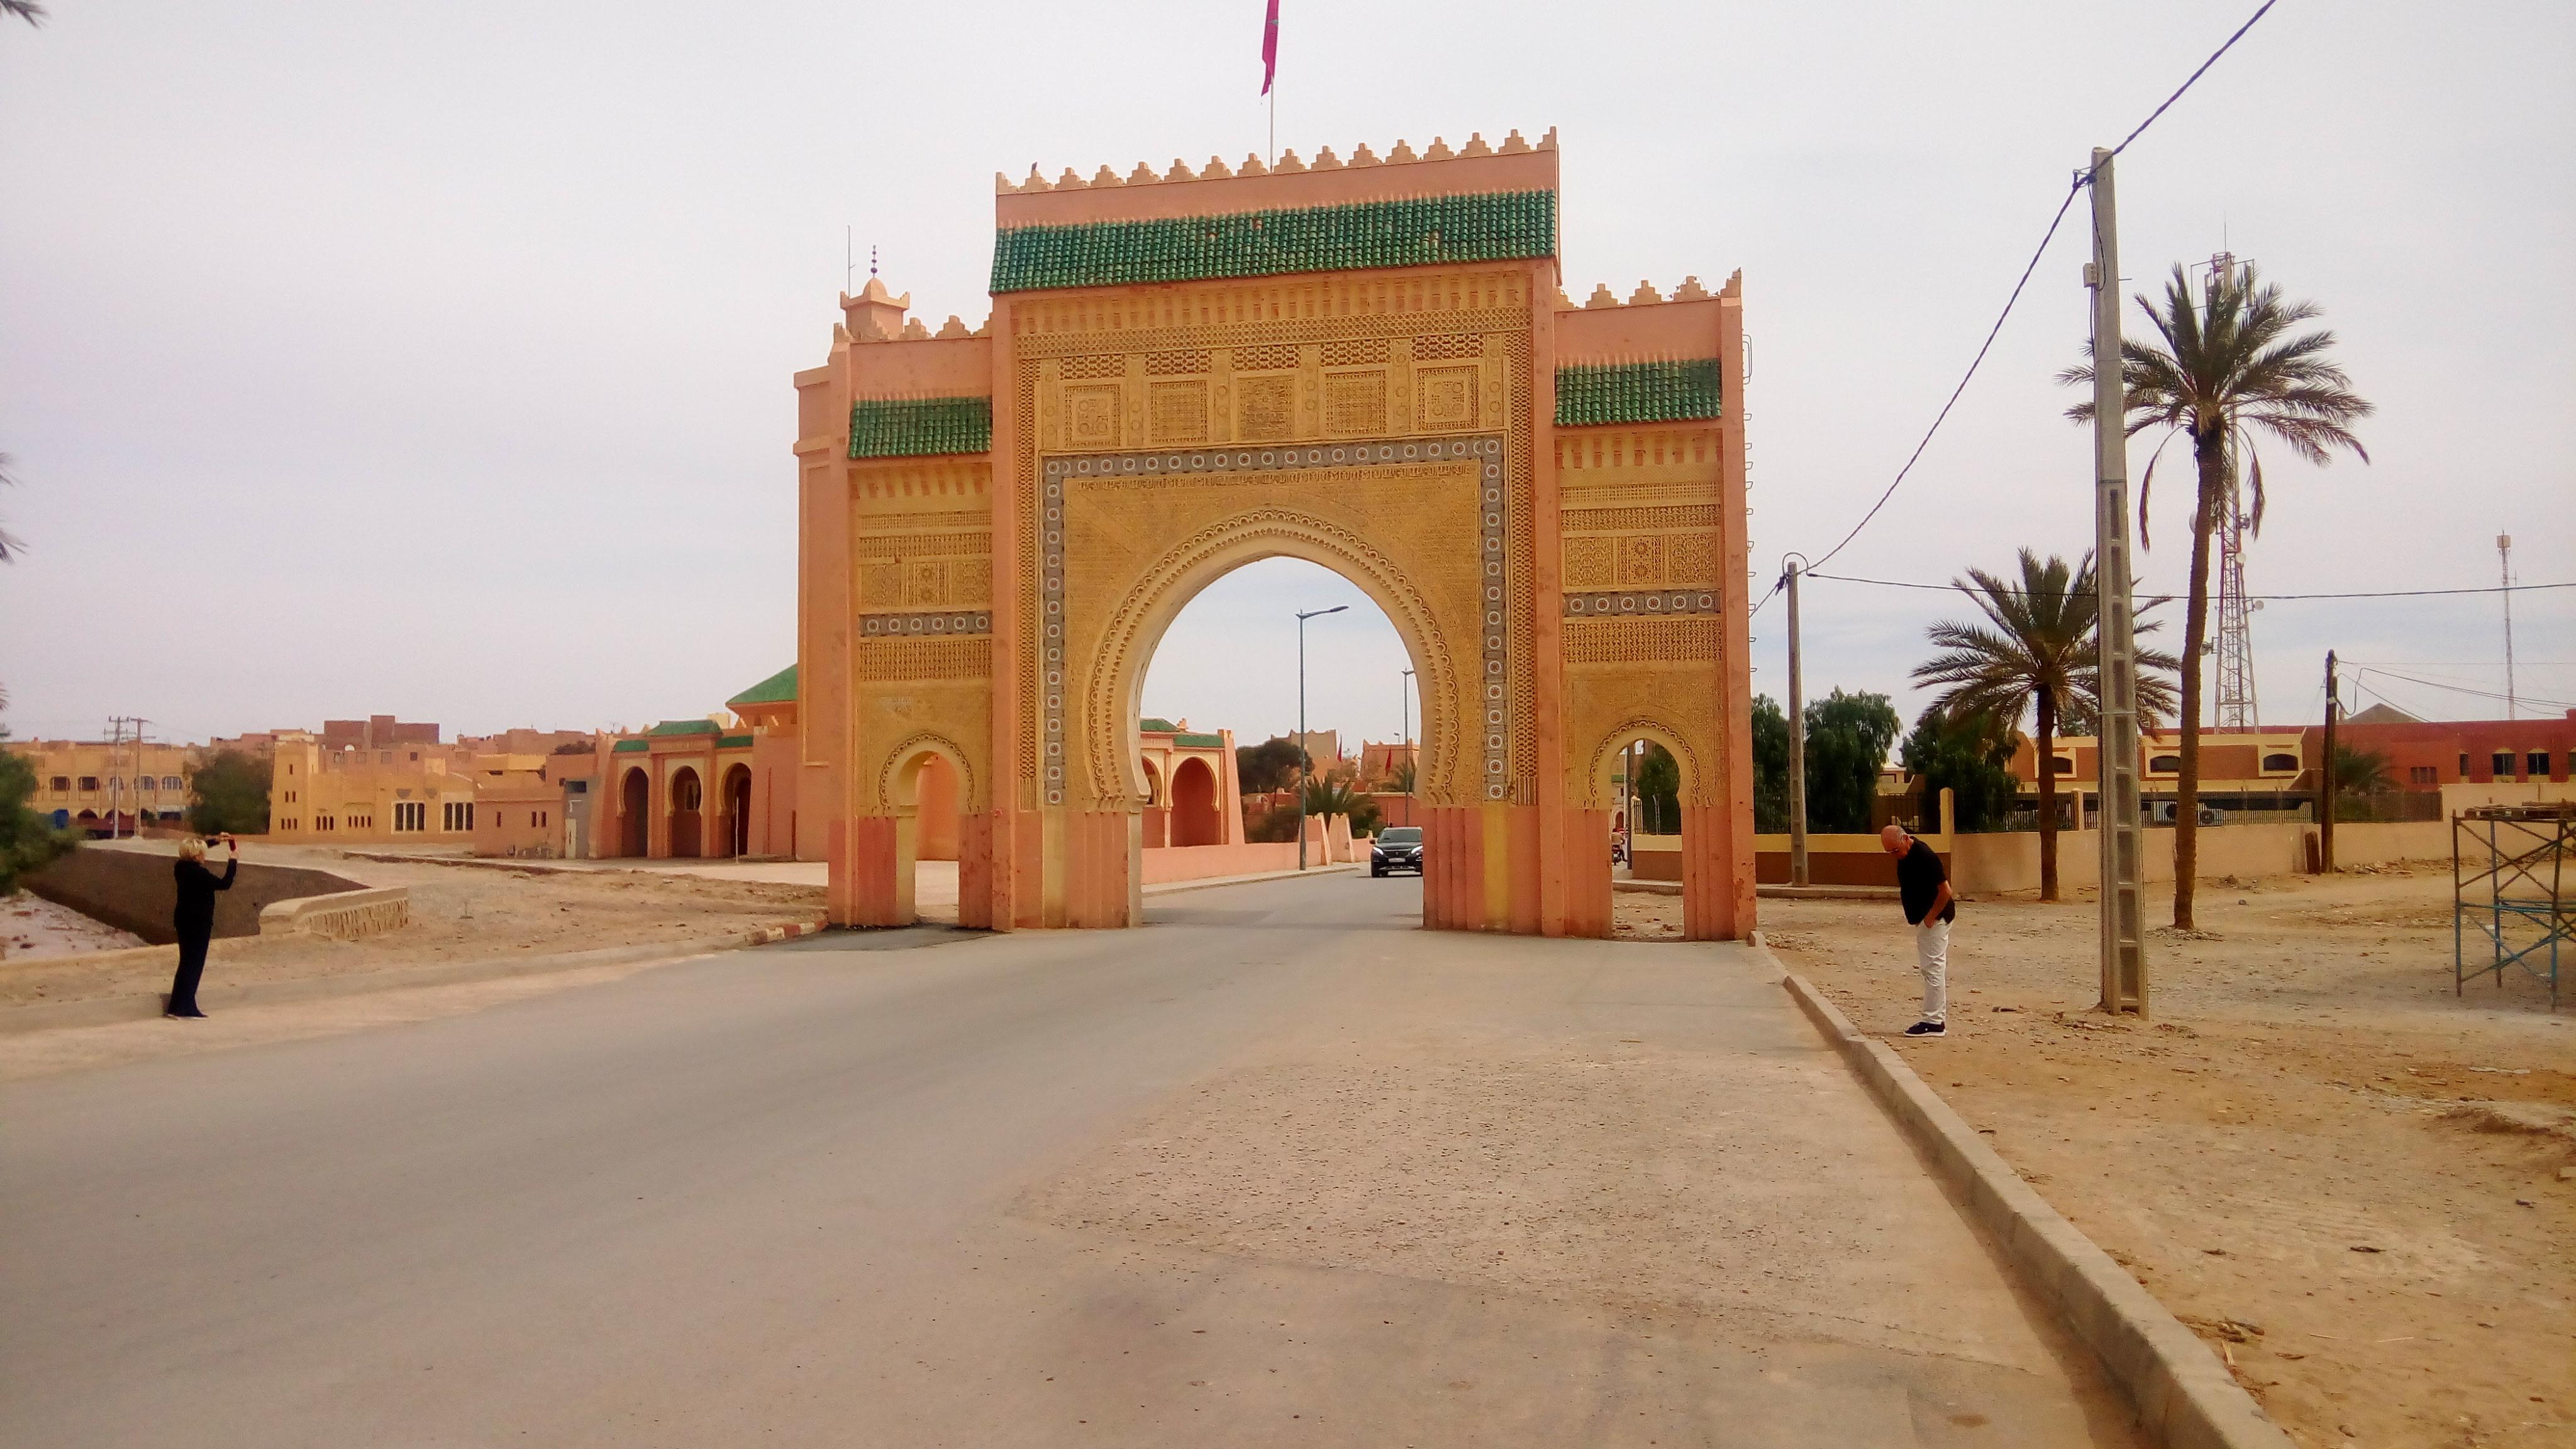 The city entrance